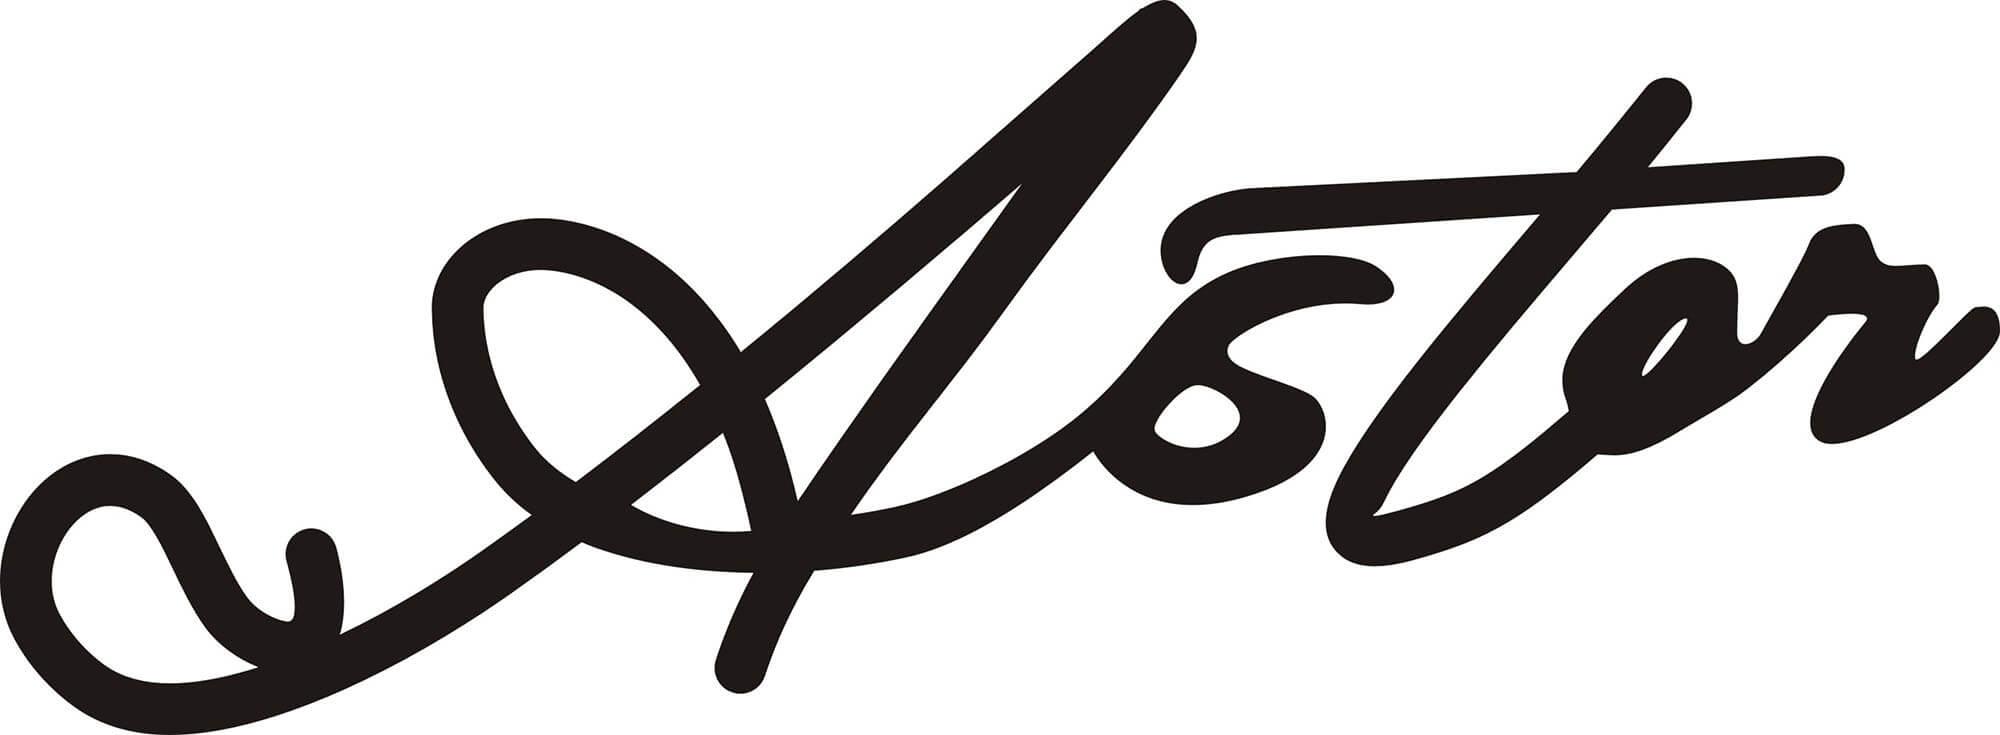 comprar-motos-astor-logo-motissimo-barcelona